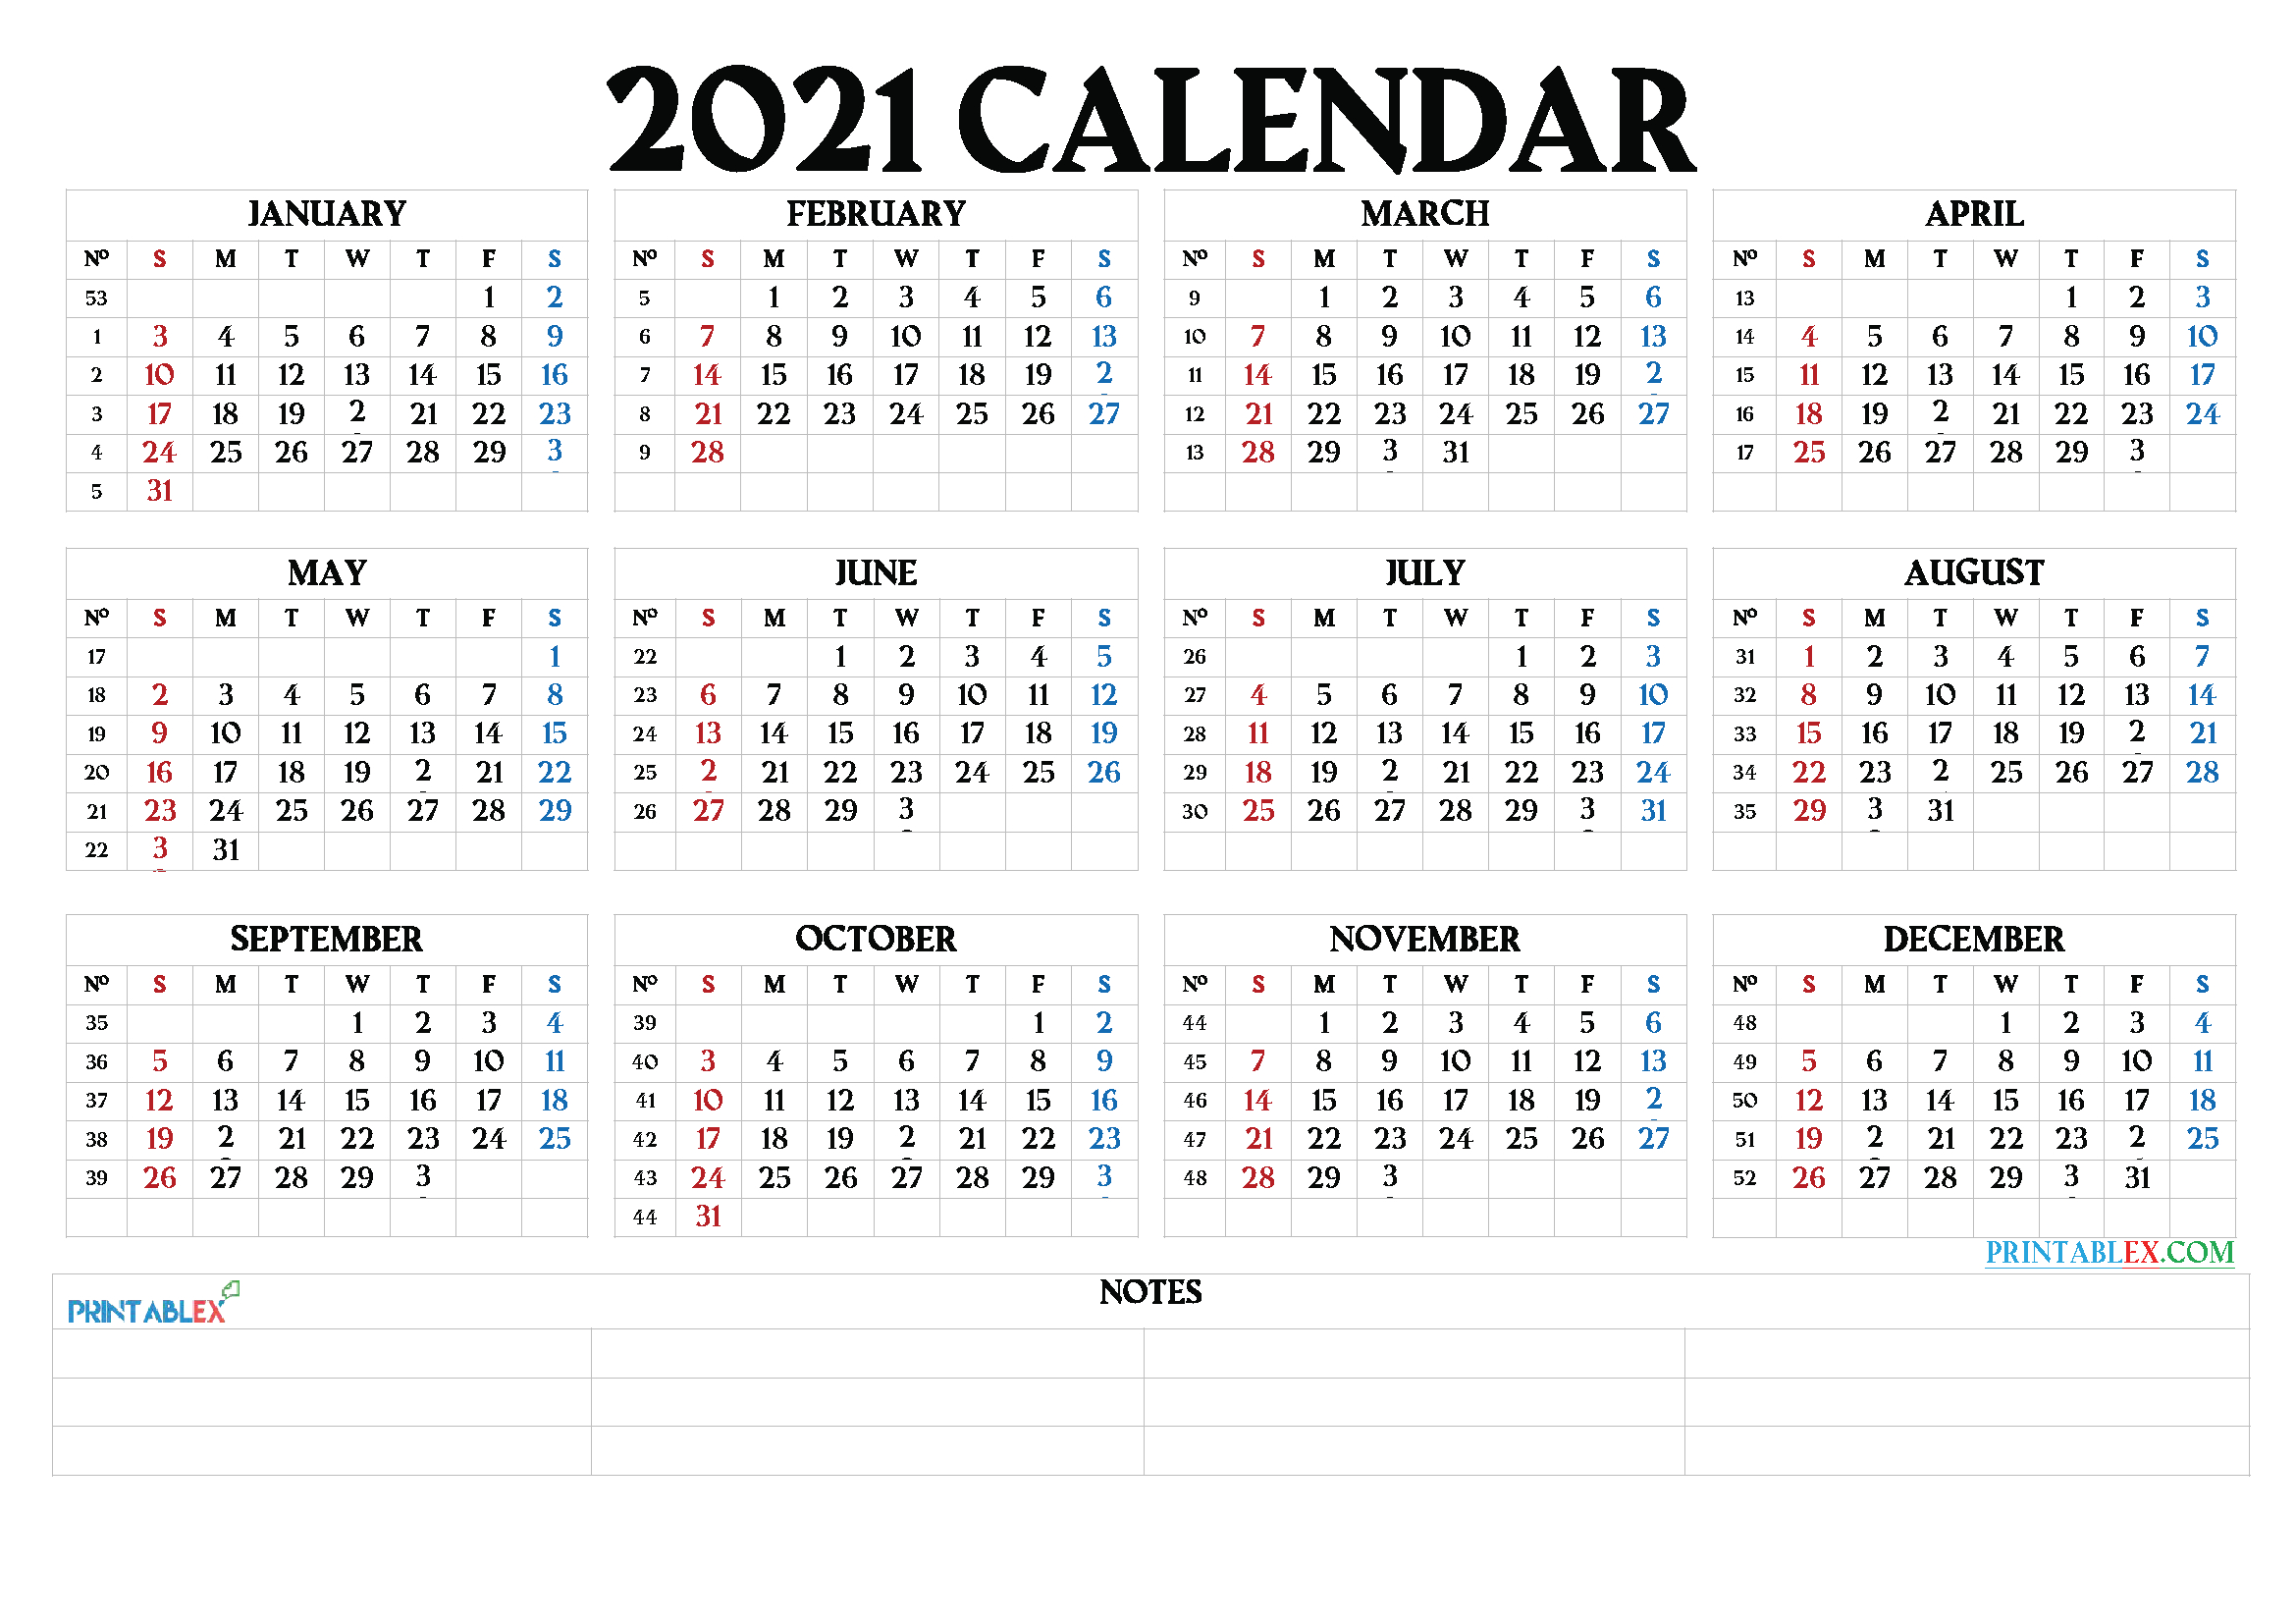 Free Printable 2021 Calendarmonth